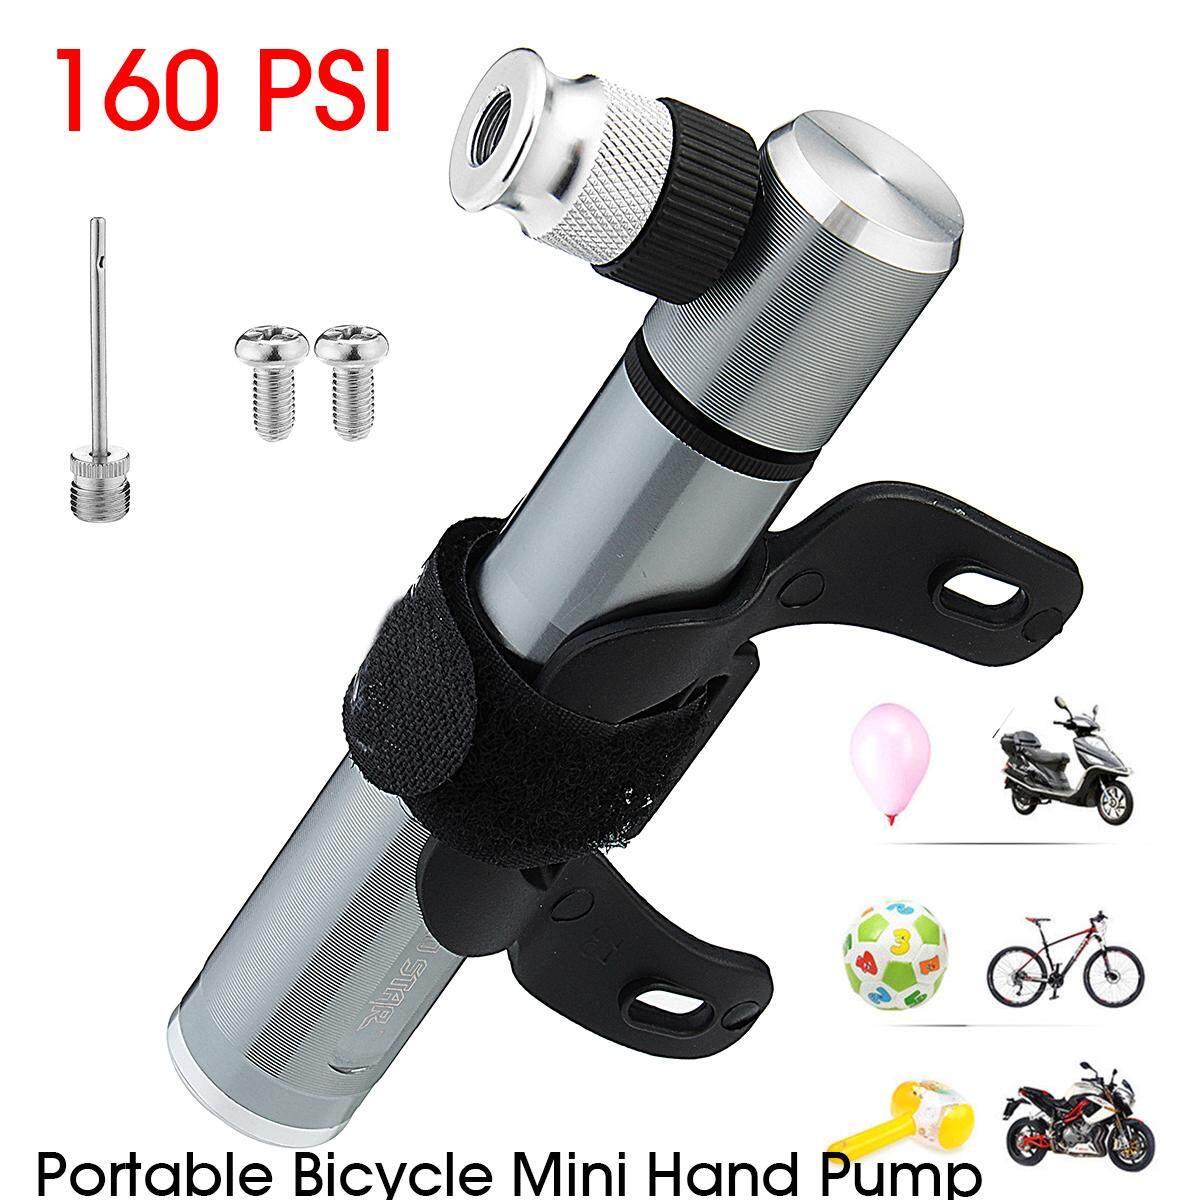 Buy Sell Cheapest 160 Gph Pompa Best Quality Product Deals Tangan Mini Sepeda Psi Basket Balon Ban Kompak Inflator Dio Intl